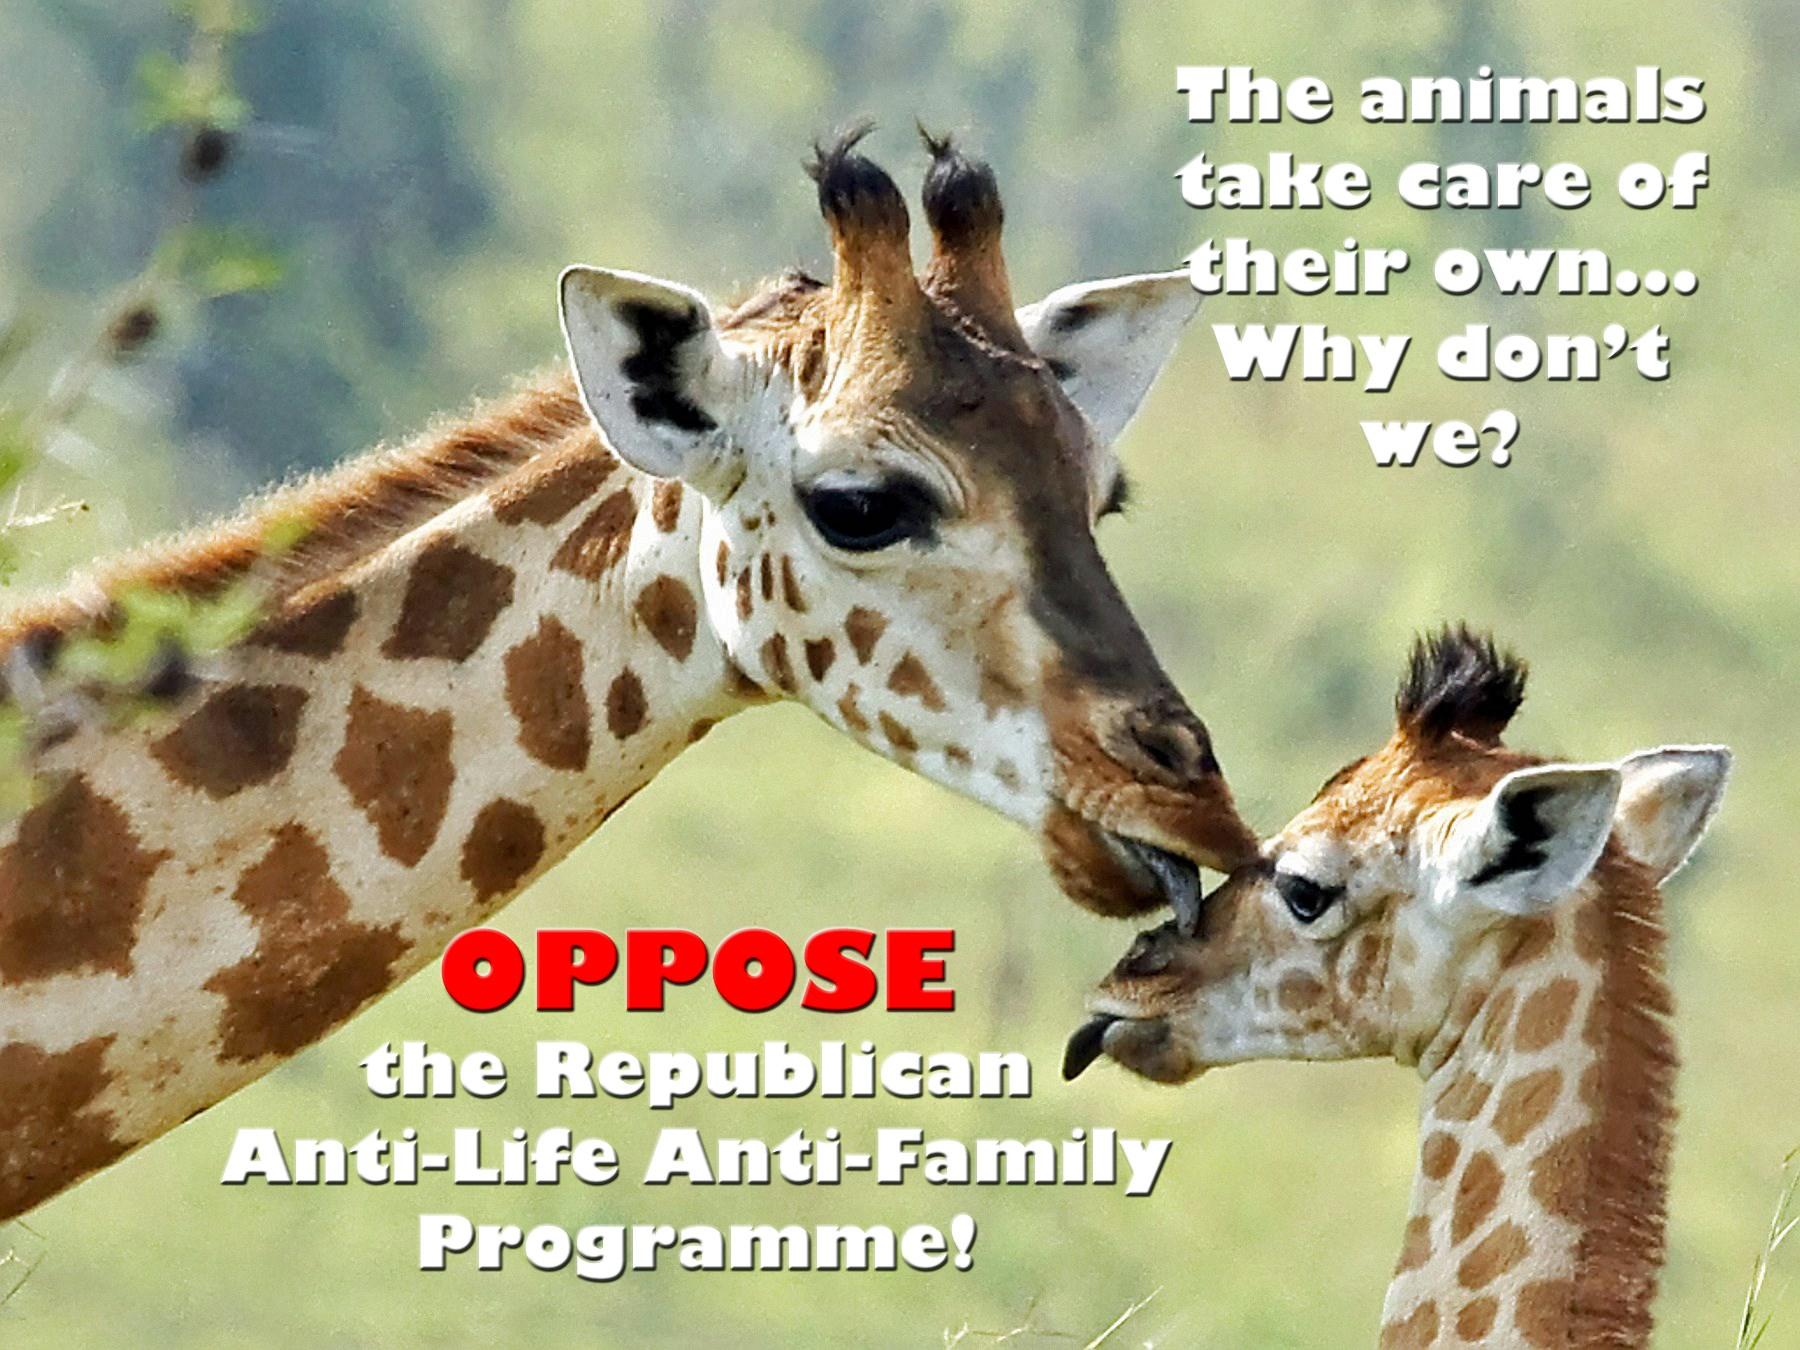 00 Oppose the GOP Anti-Life programme 130915